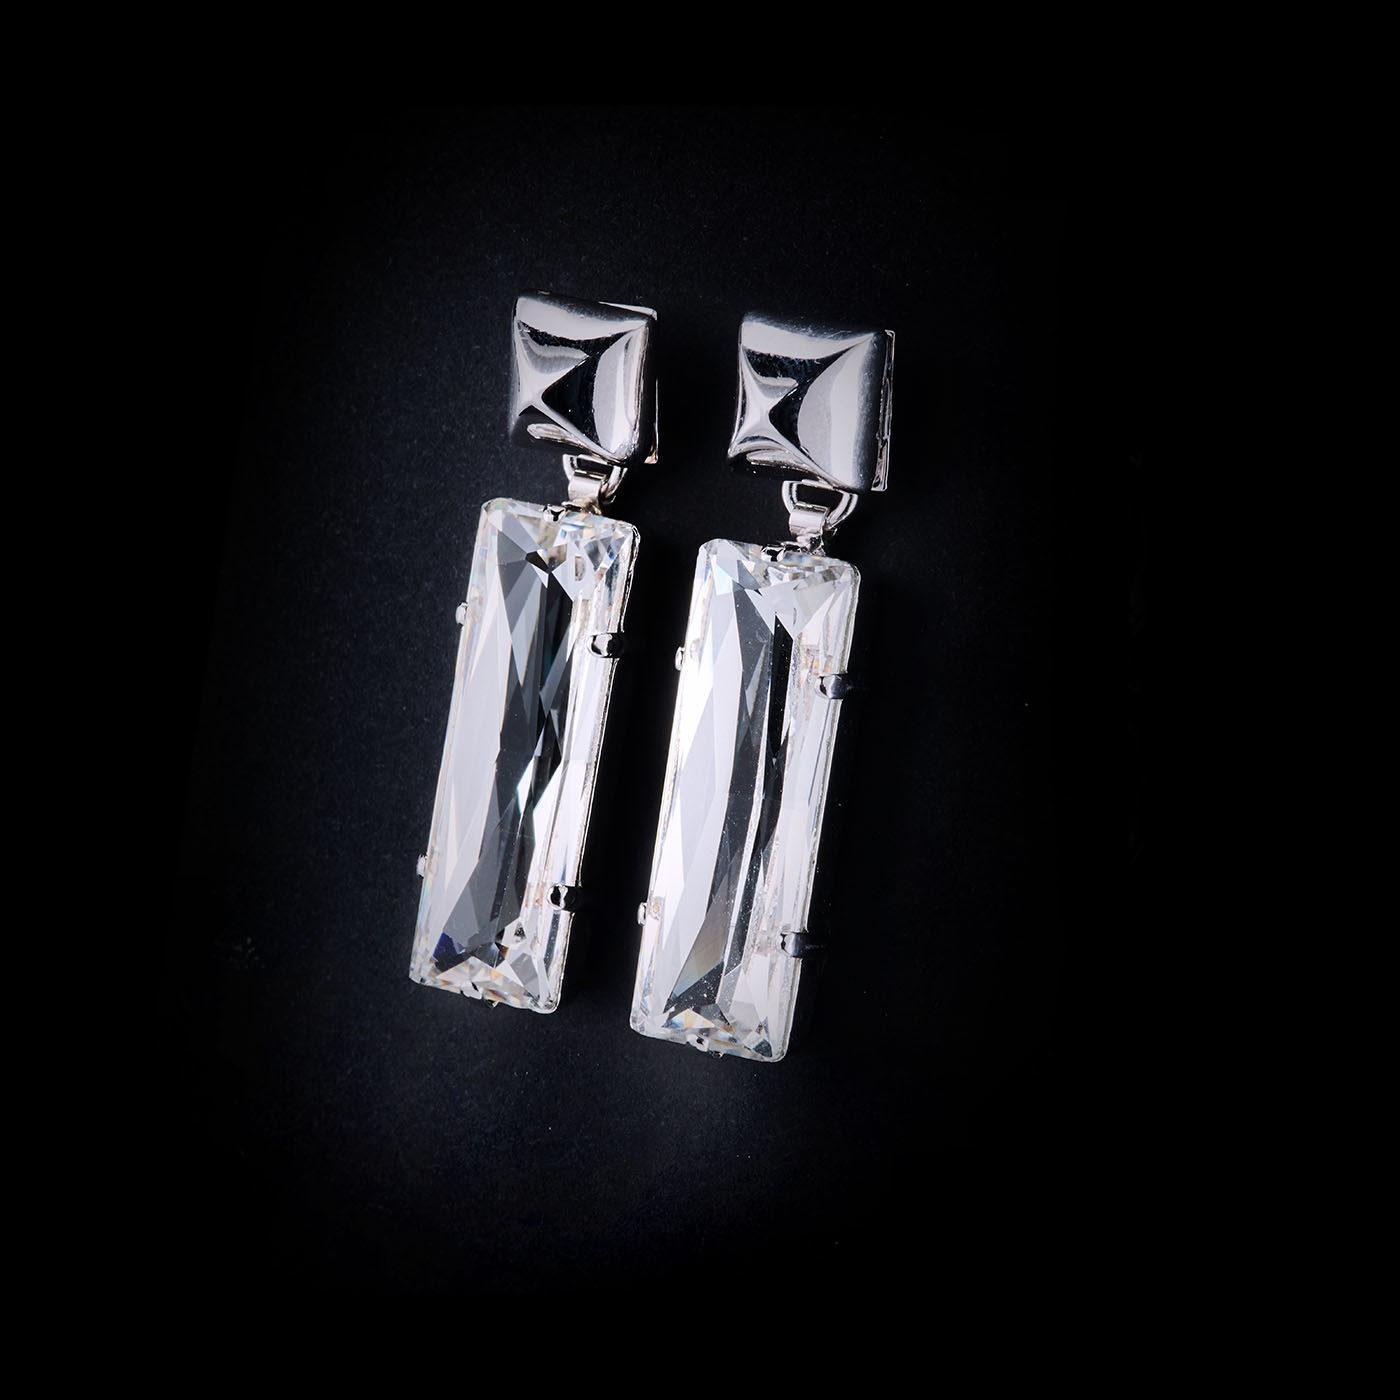 Bjorn van den Berg Fragile Earrings Small Clear